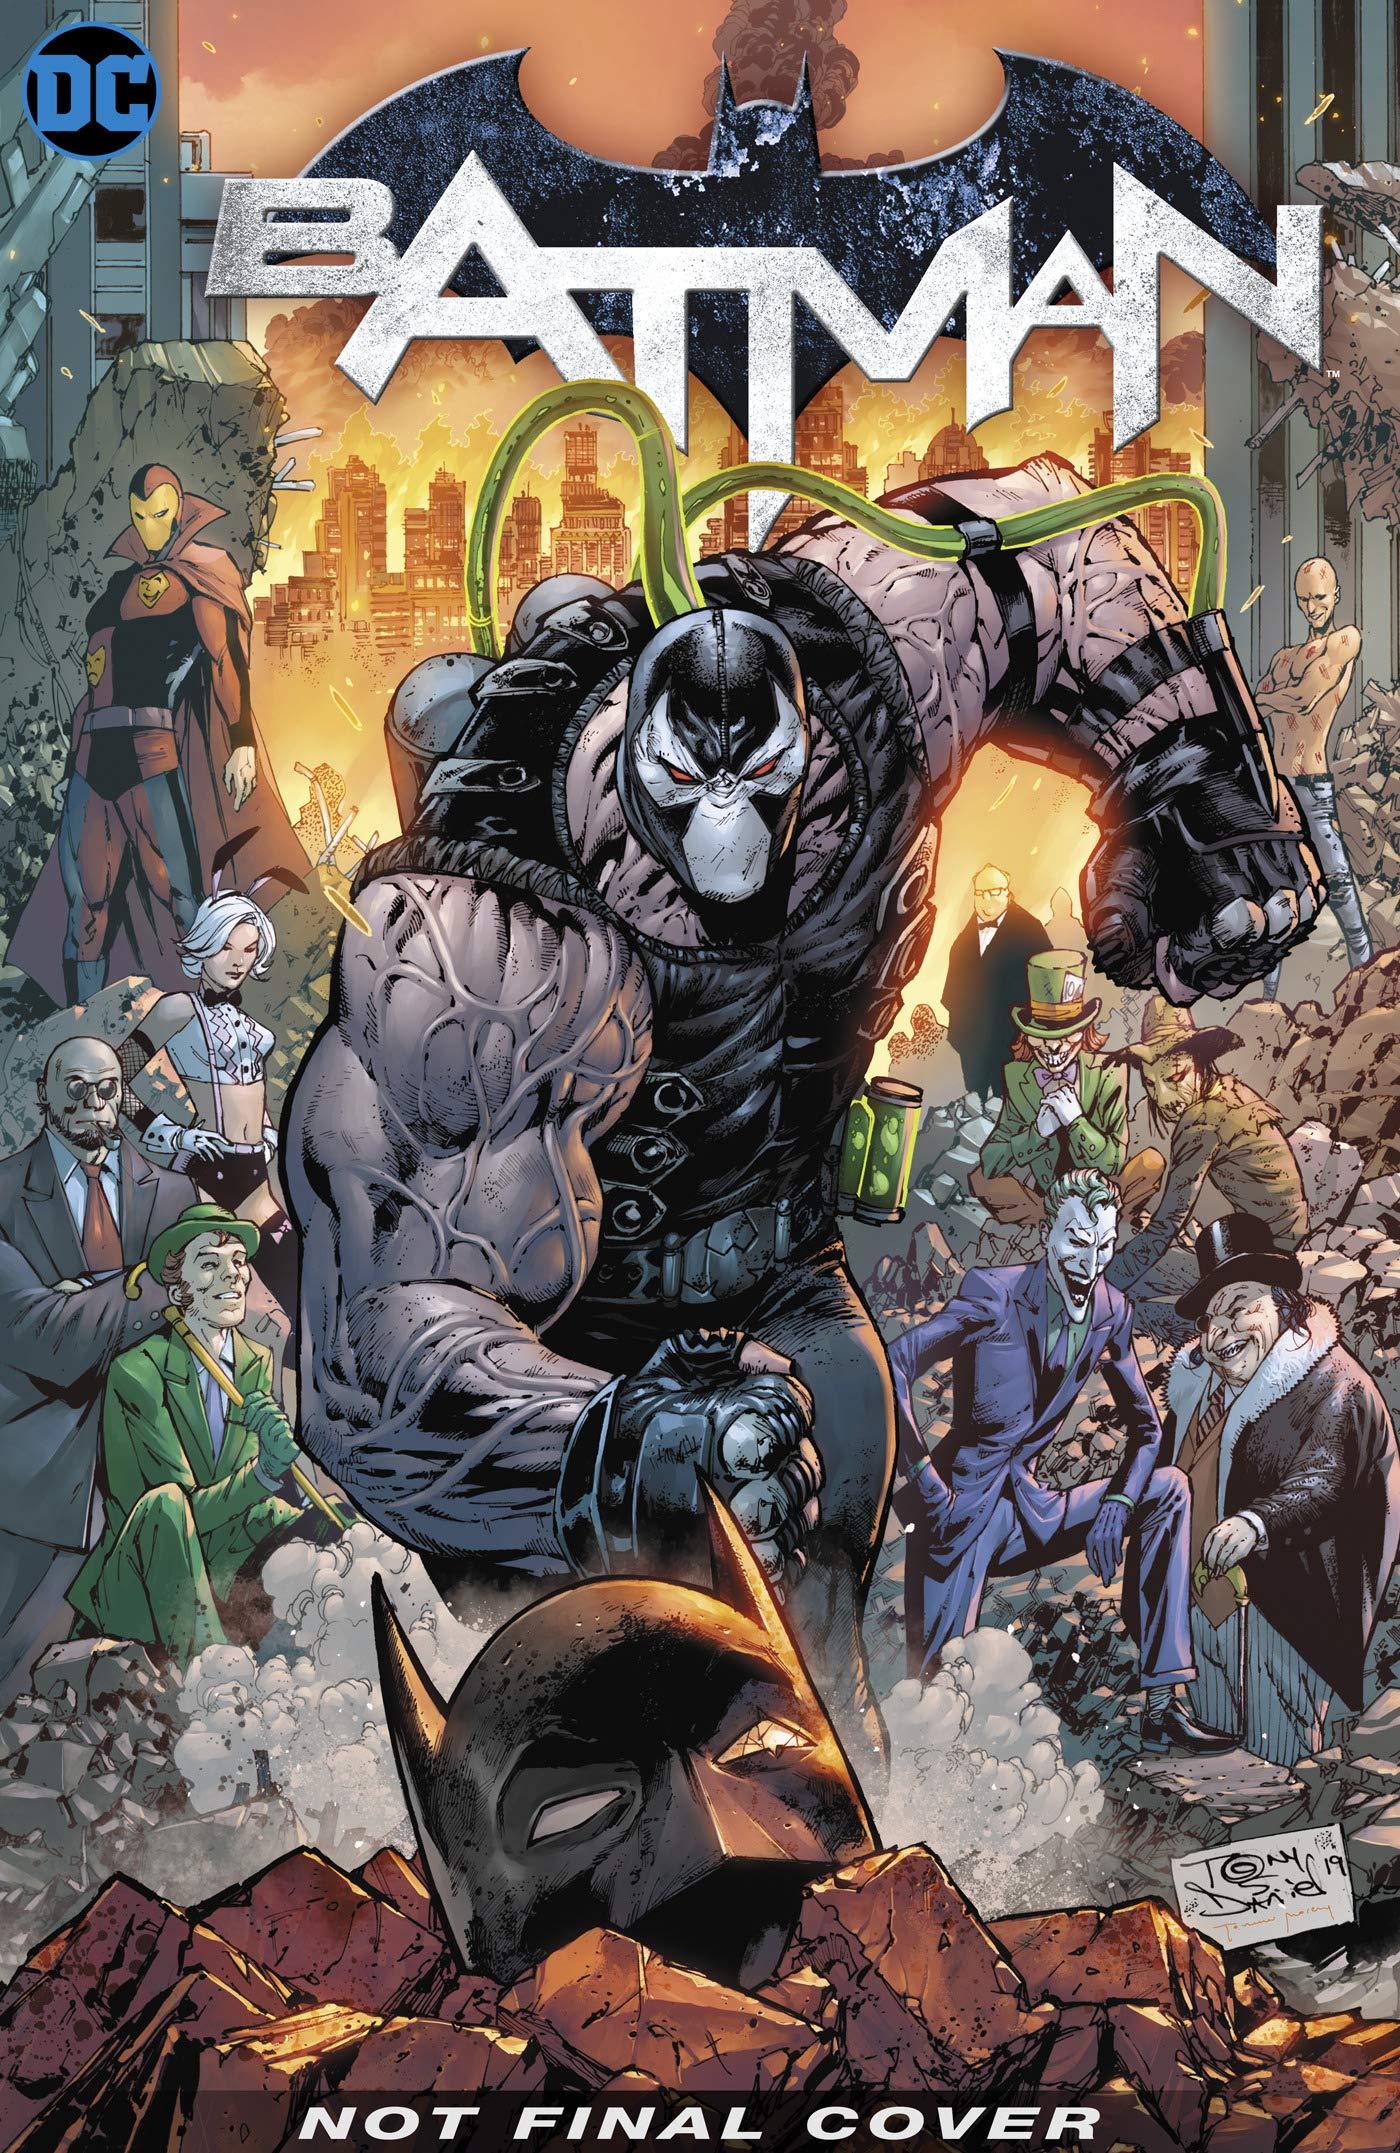 Batman, Volume 12: City of Bane Part 1 by Sandu Florea, Mitch Gerads, Tom King, Clay Mann, Tony S. Daniel, Mikel Janín